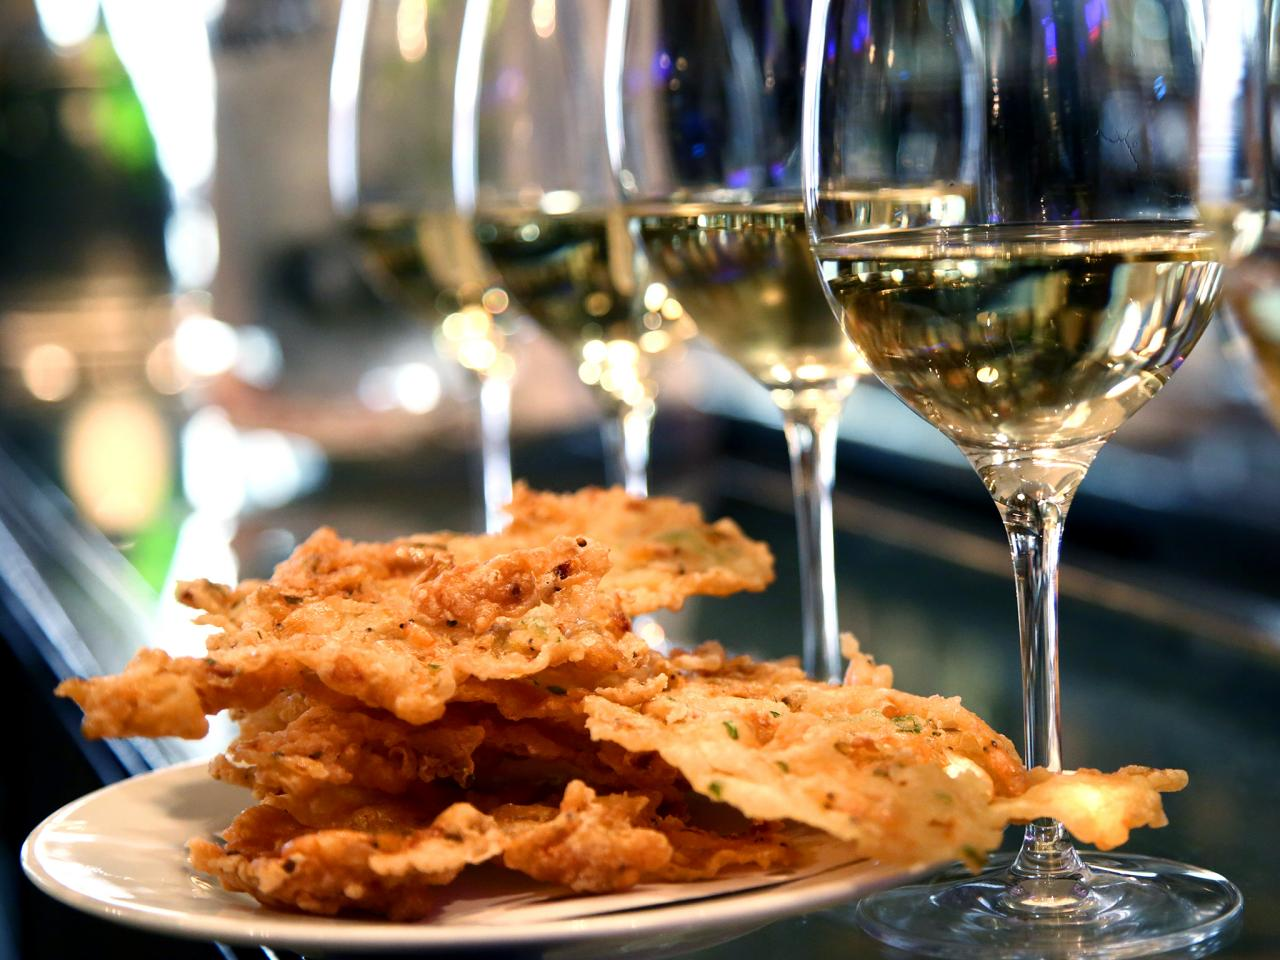 food-paradise-international-007-deep-fried.jpg.rend.tccom.1280.960.jpeg